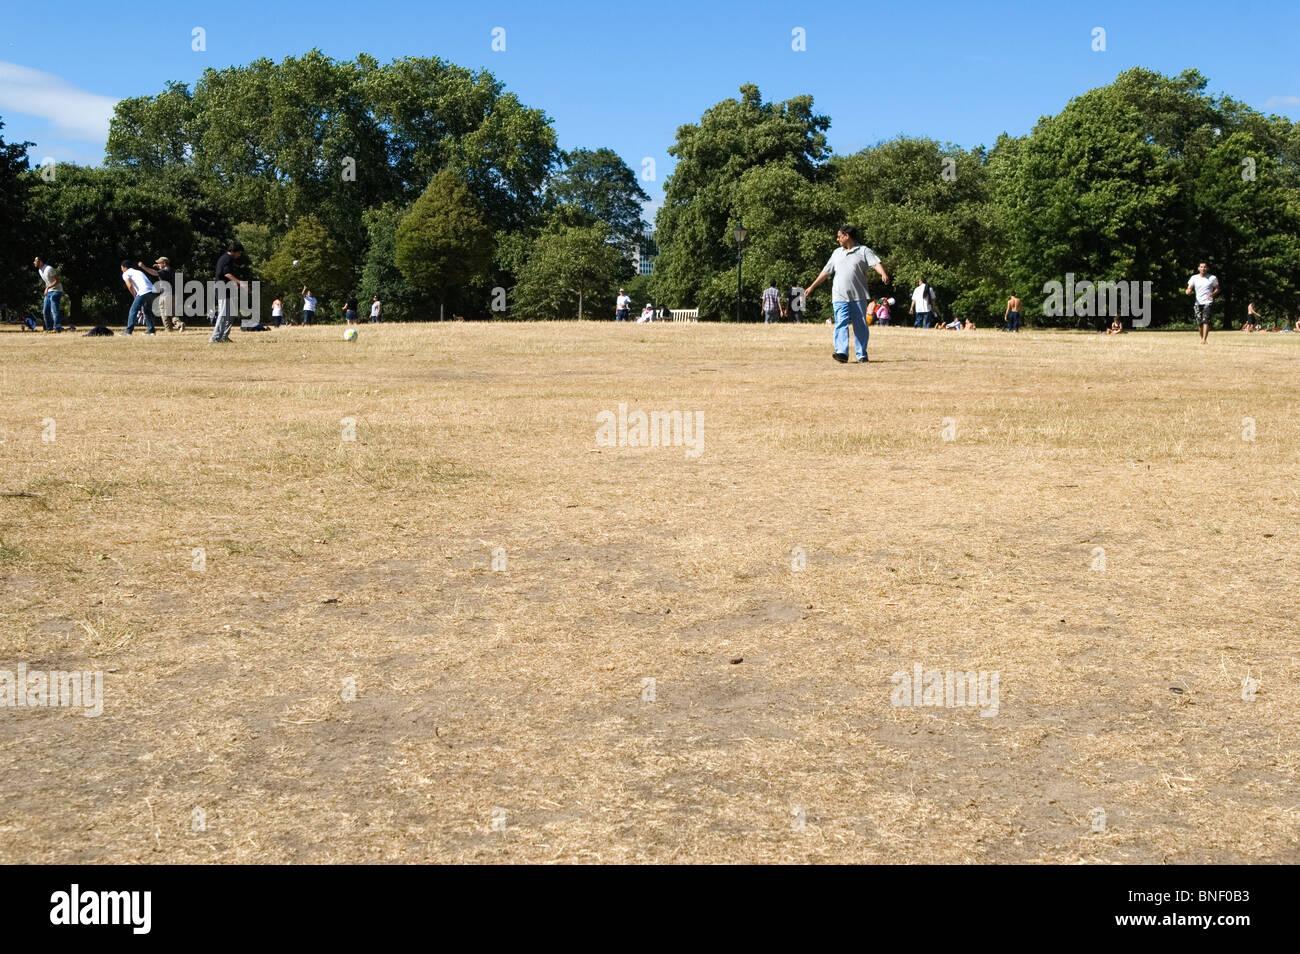 Heat wave, dry summer Hyde Park London Uk - Stock Image